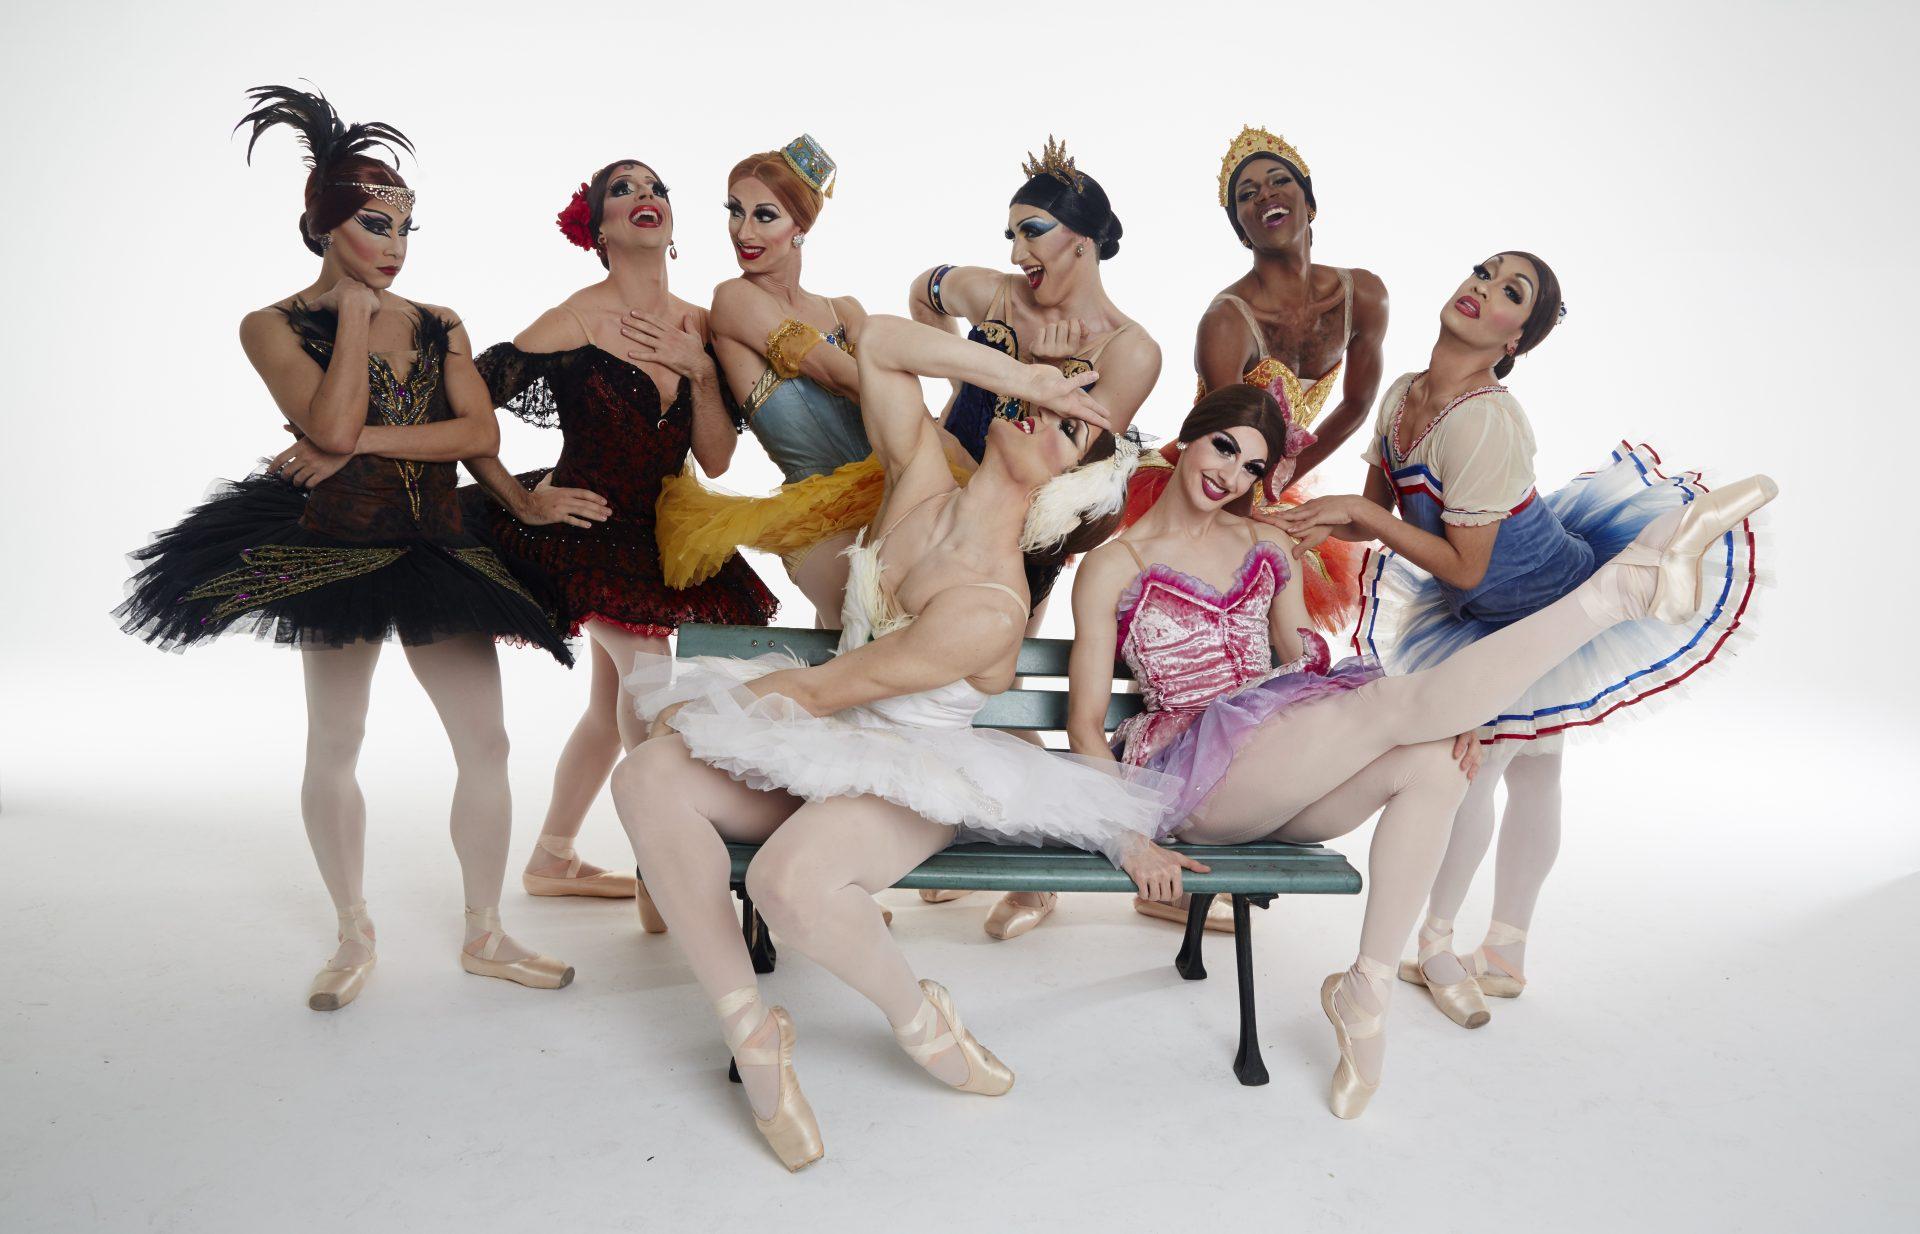 Les Ballets Trockadero de Monte Carlo returns to Vancouver this winter